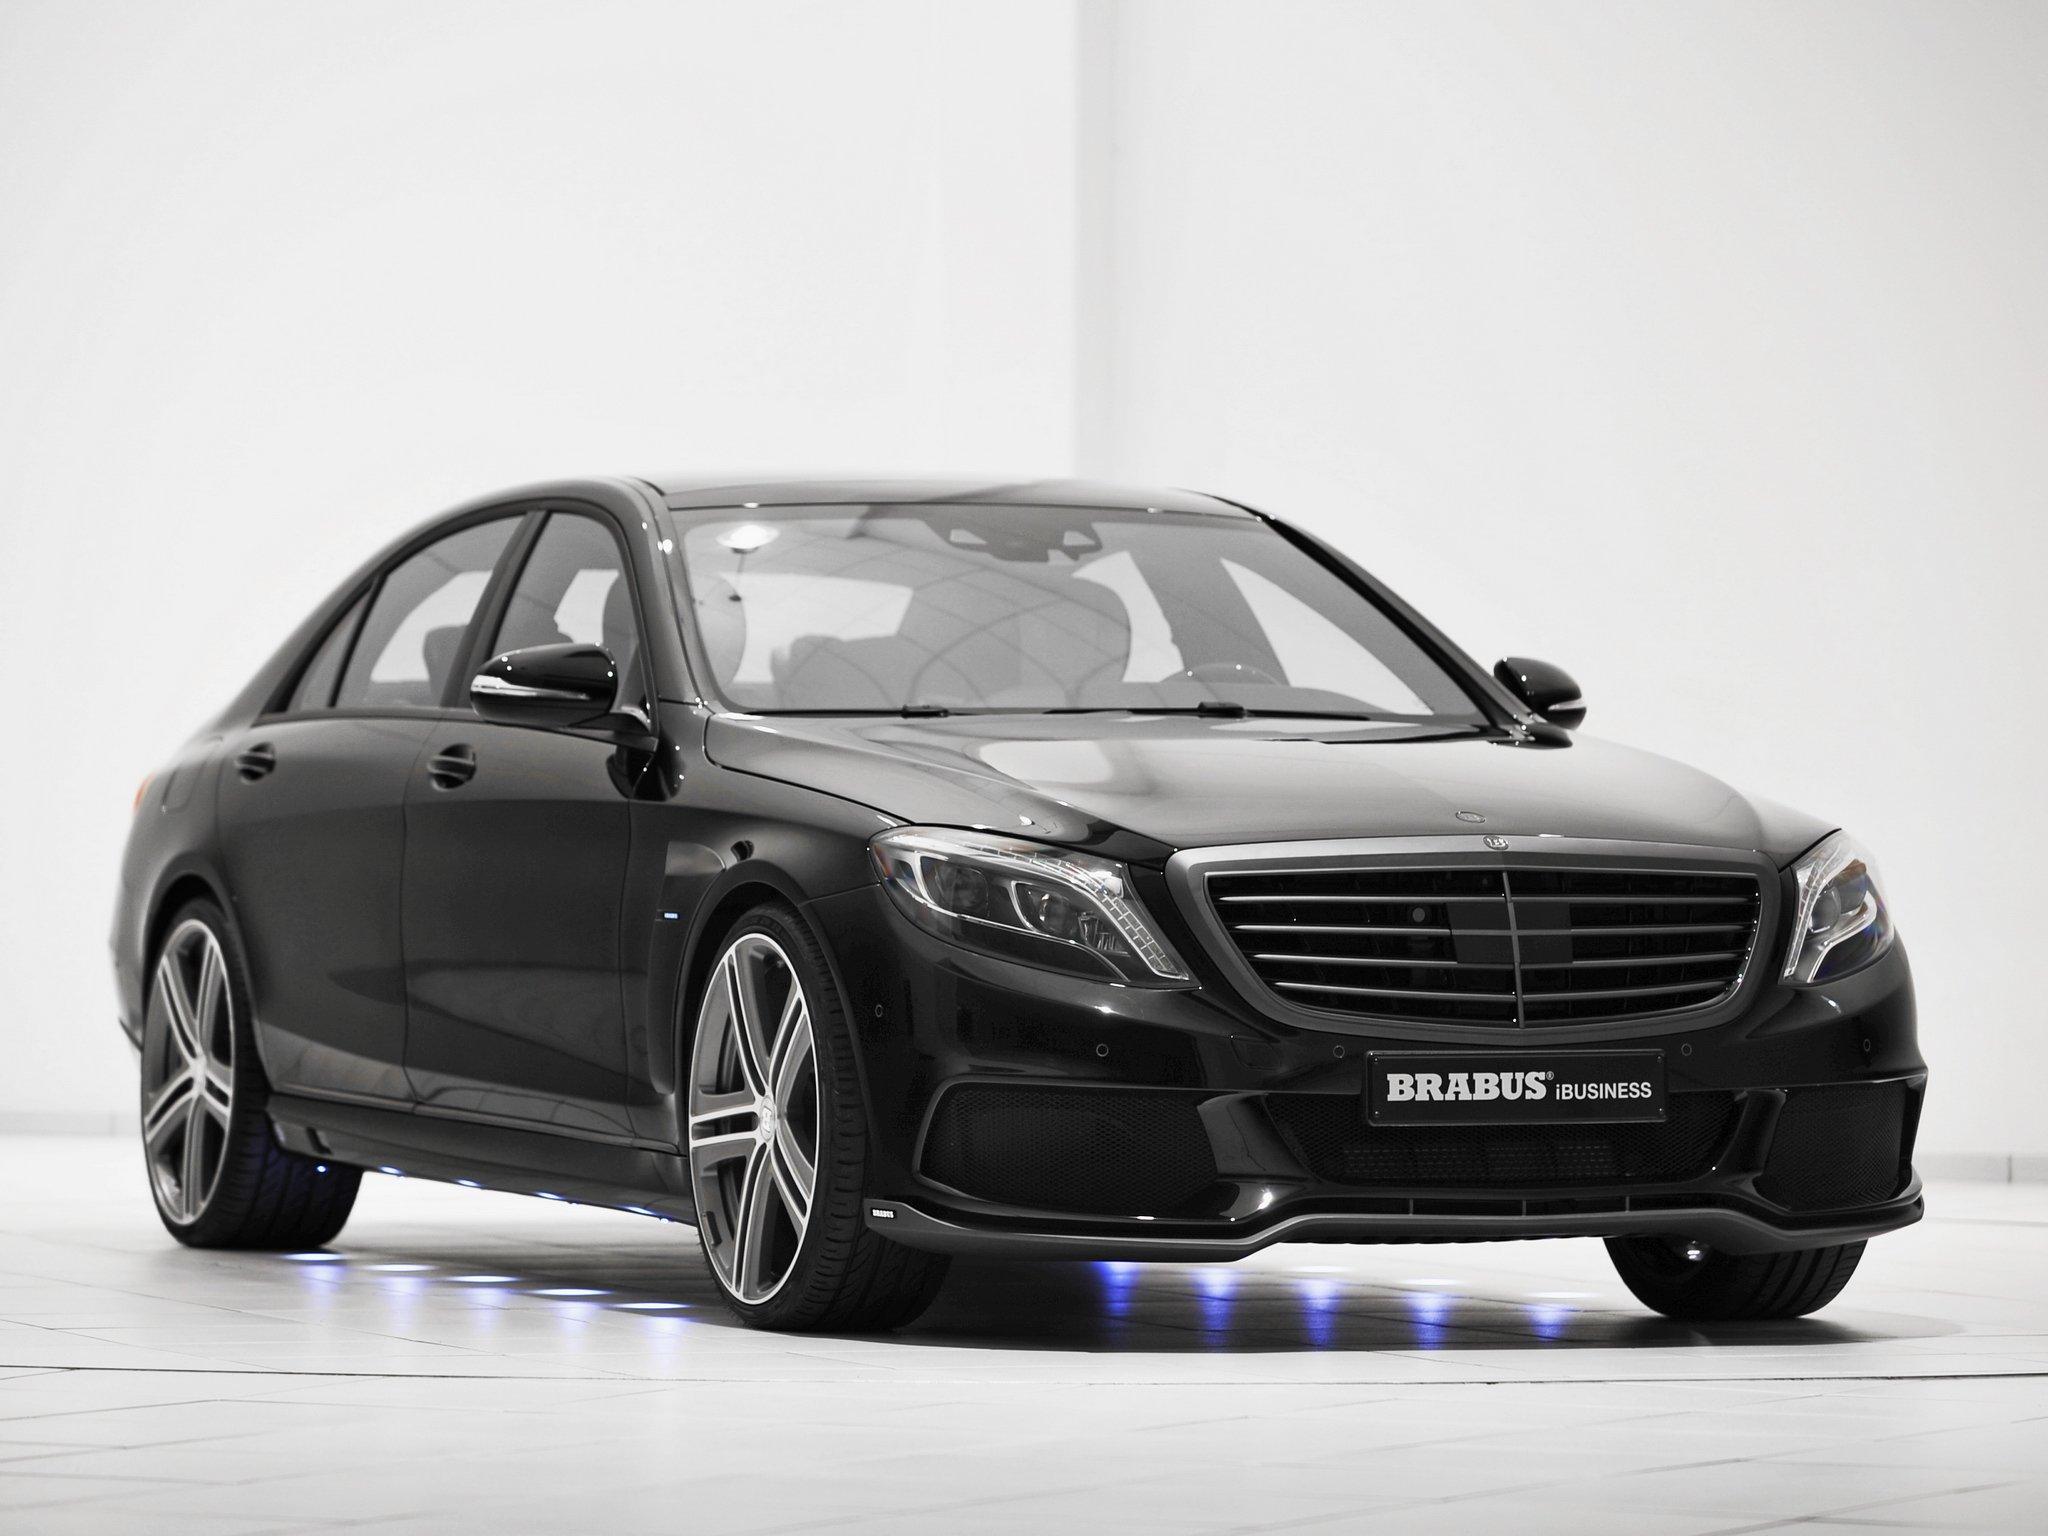 Mercedes-Benz Brabus 850 6.0 Biturbo IBusiness (4)